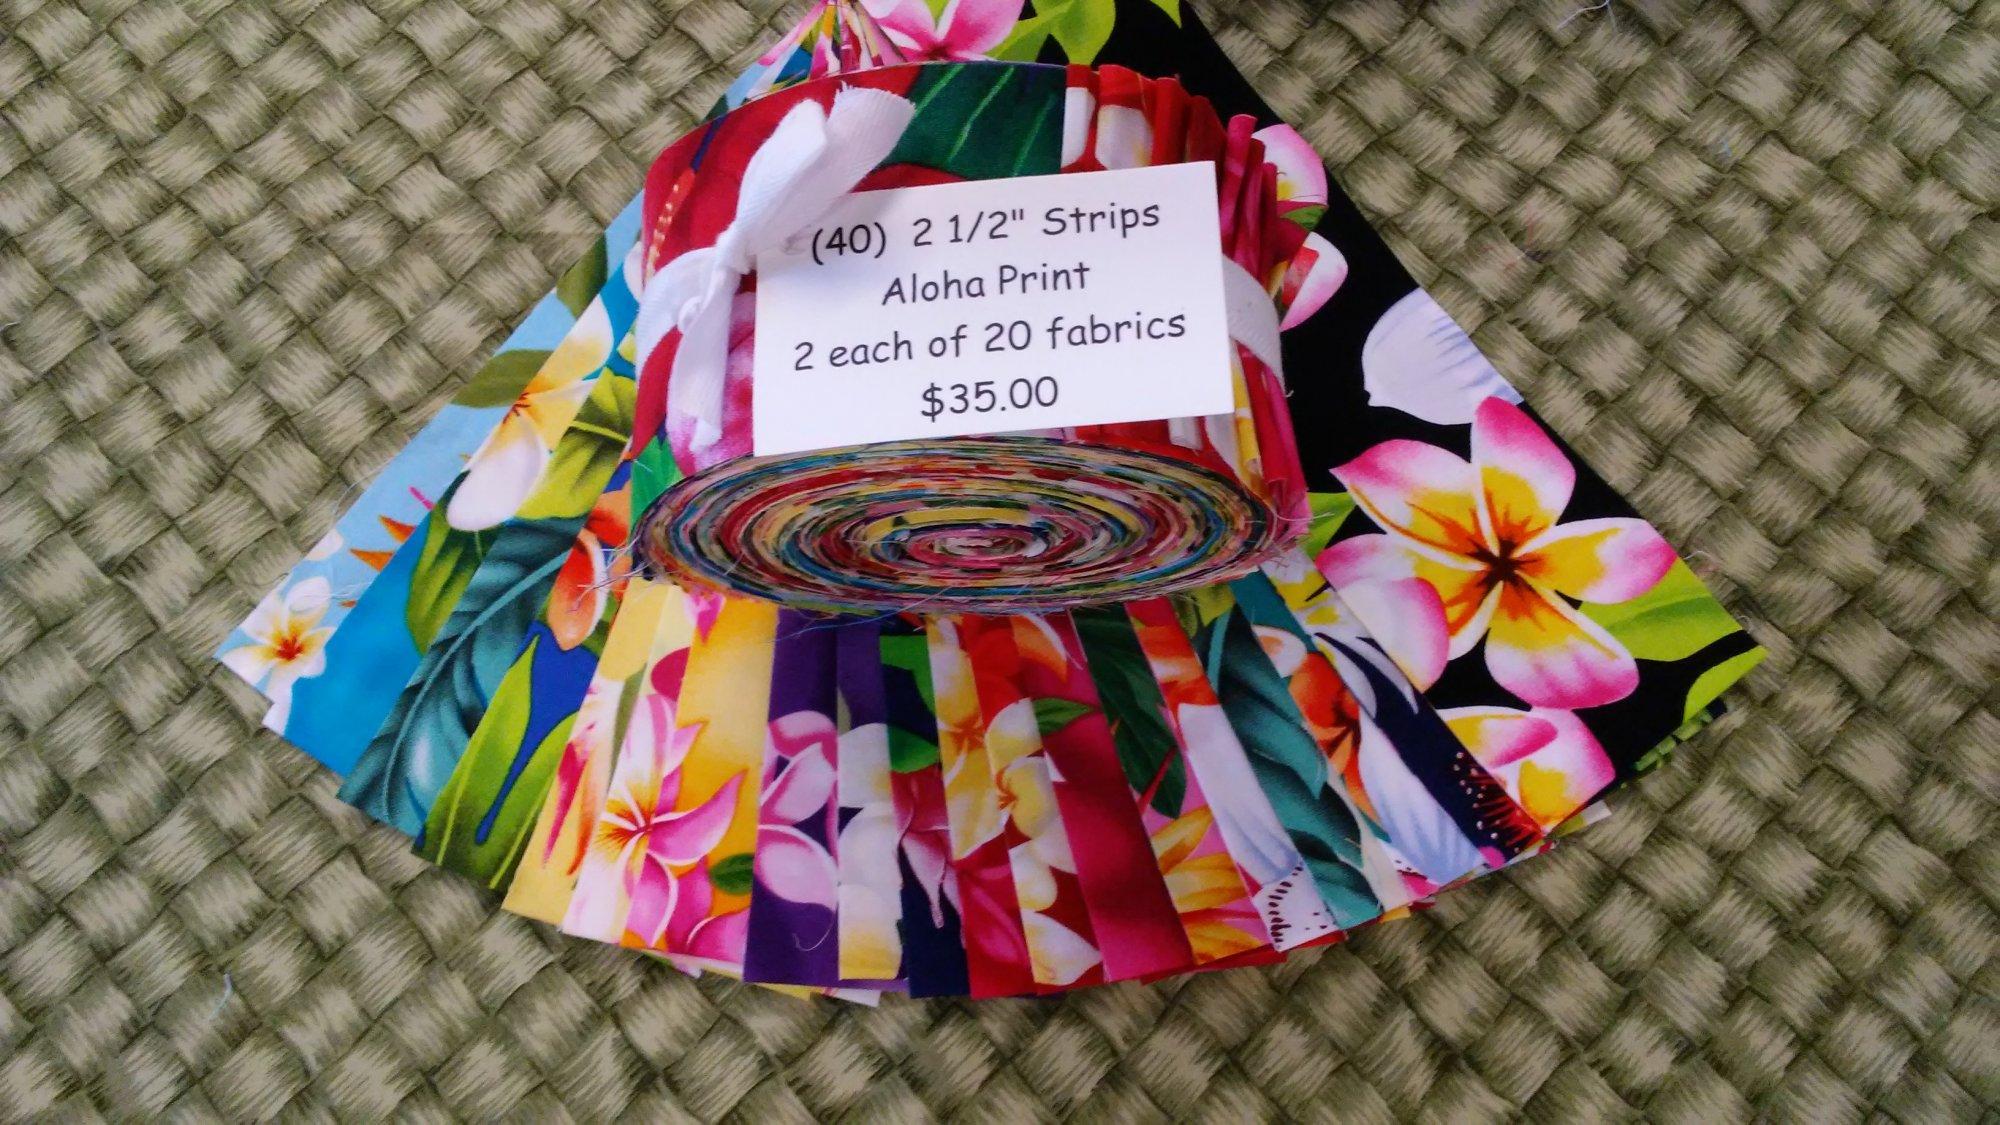 (40) Hawaiian Floral 2 1/2 Strip Set